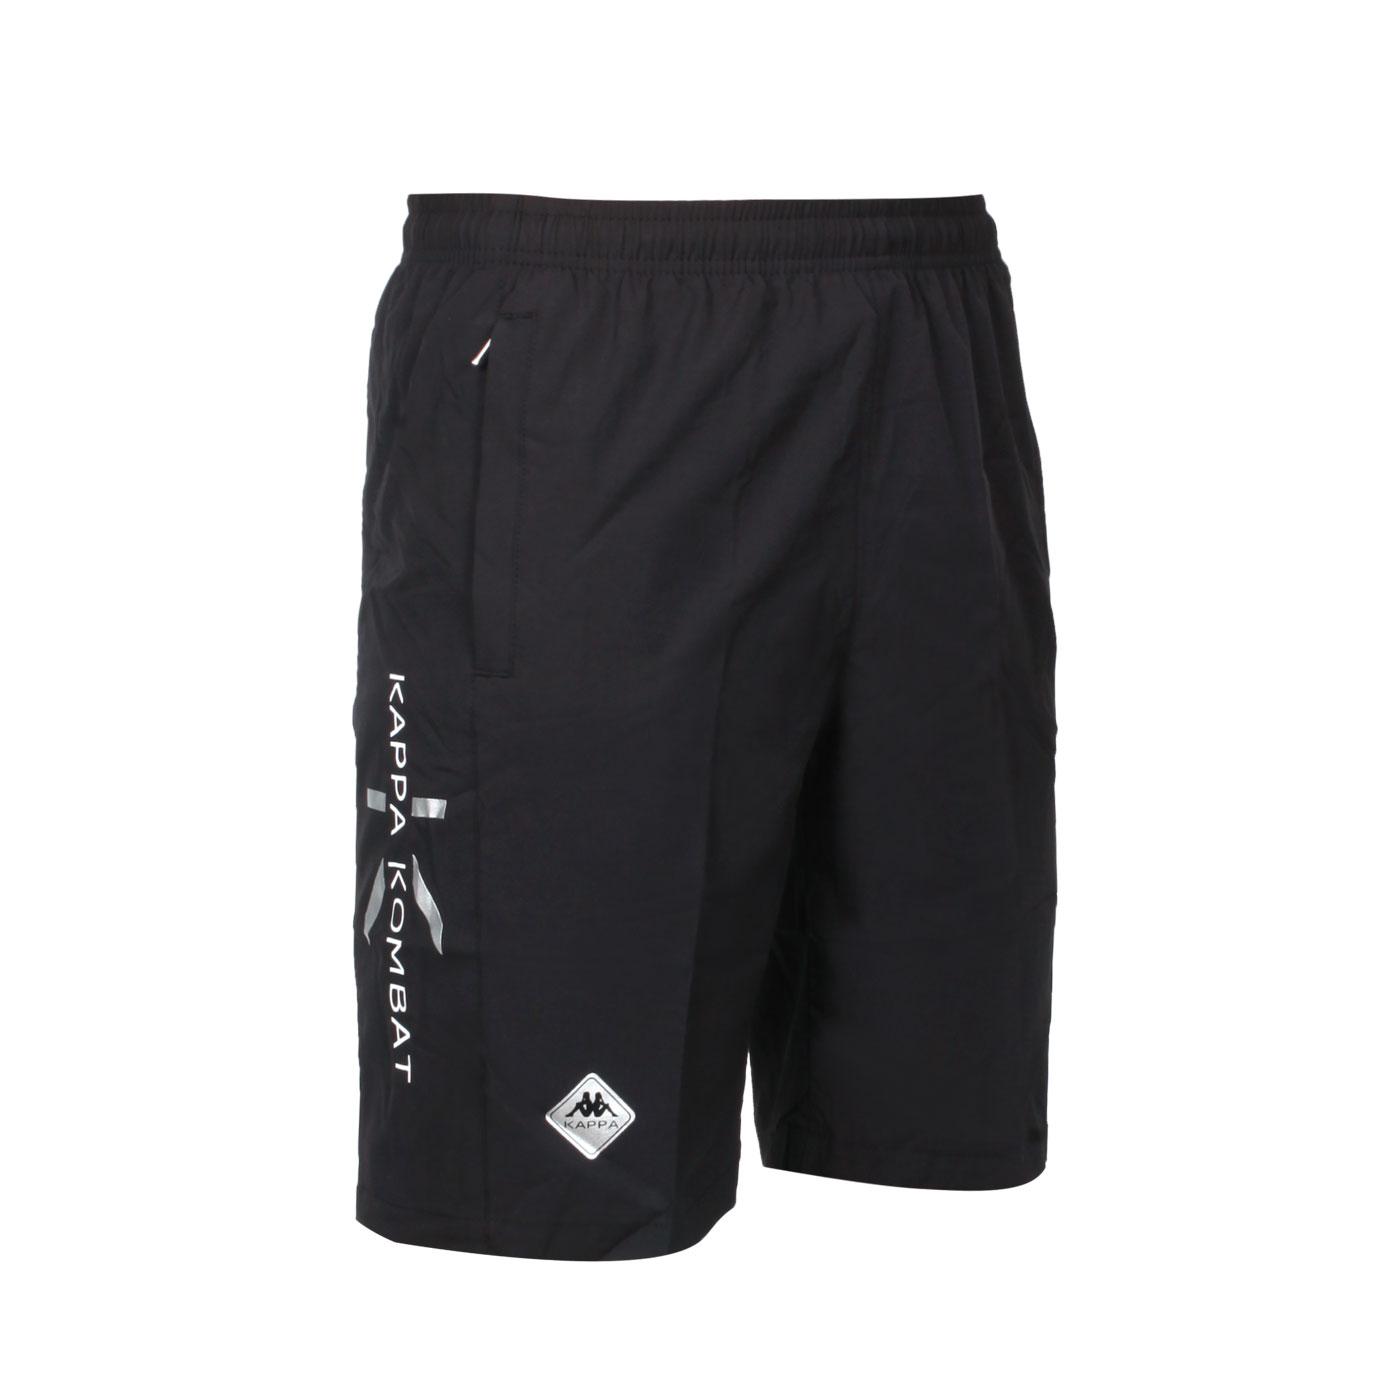 KAPPA 男款K4T單層半短褲 32166UW-005 - 黑白